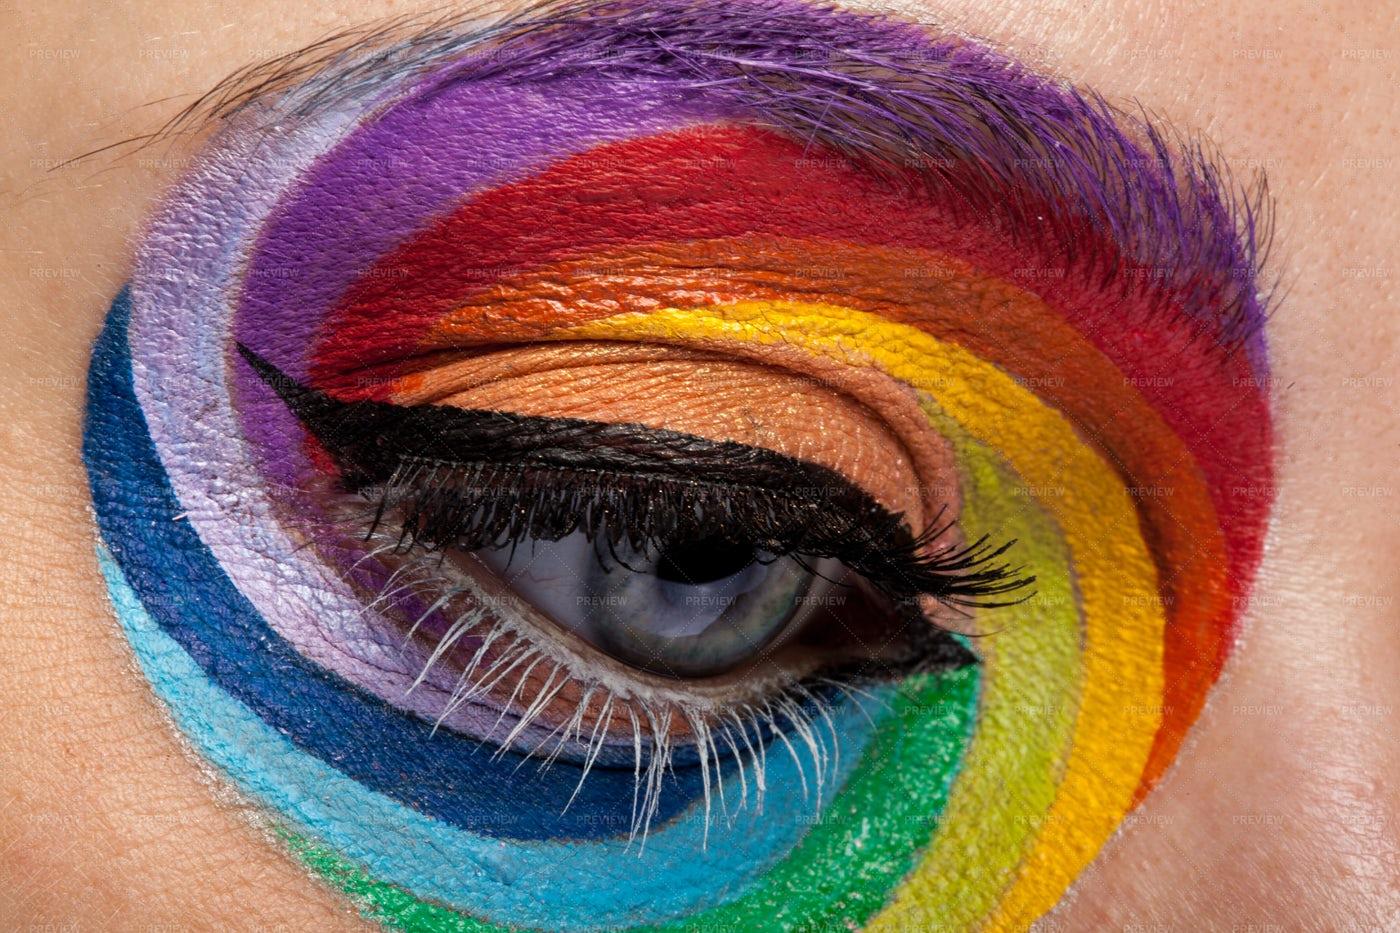 Close Up Of Beautiful Eye With Rainbow: Stock Photos